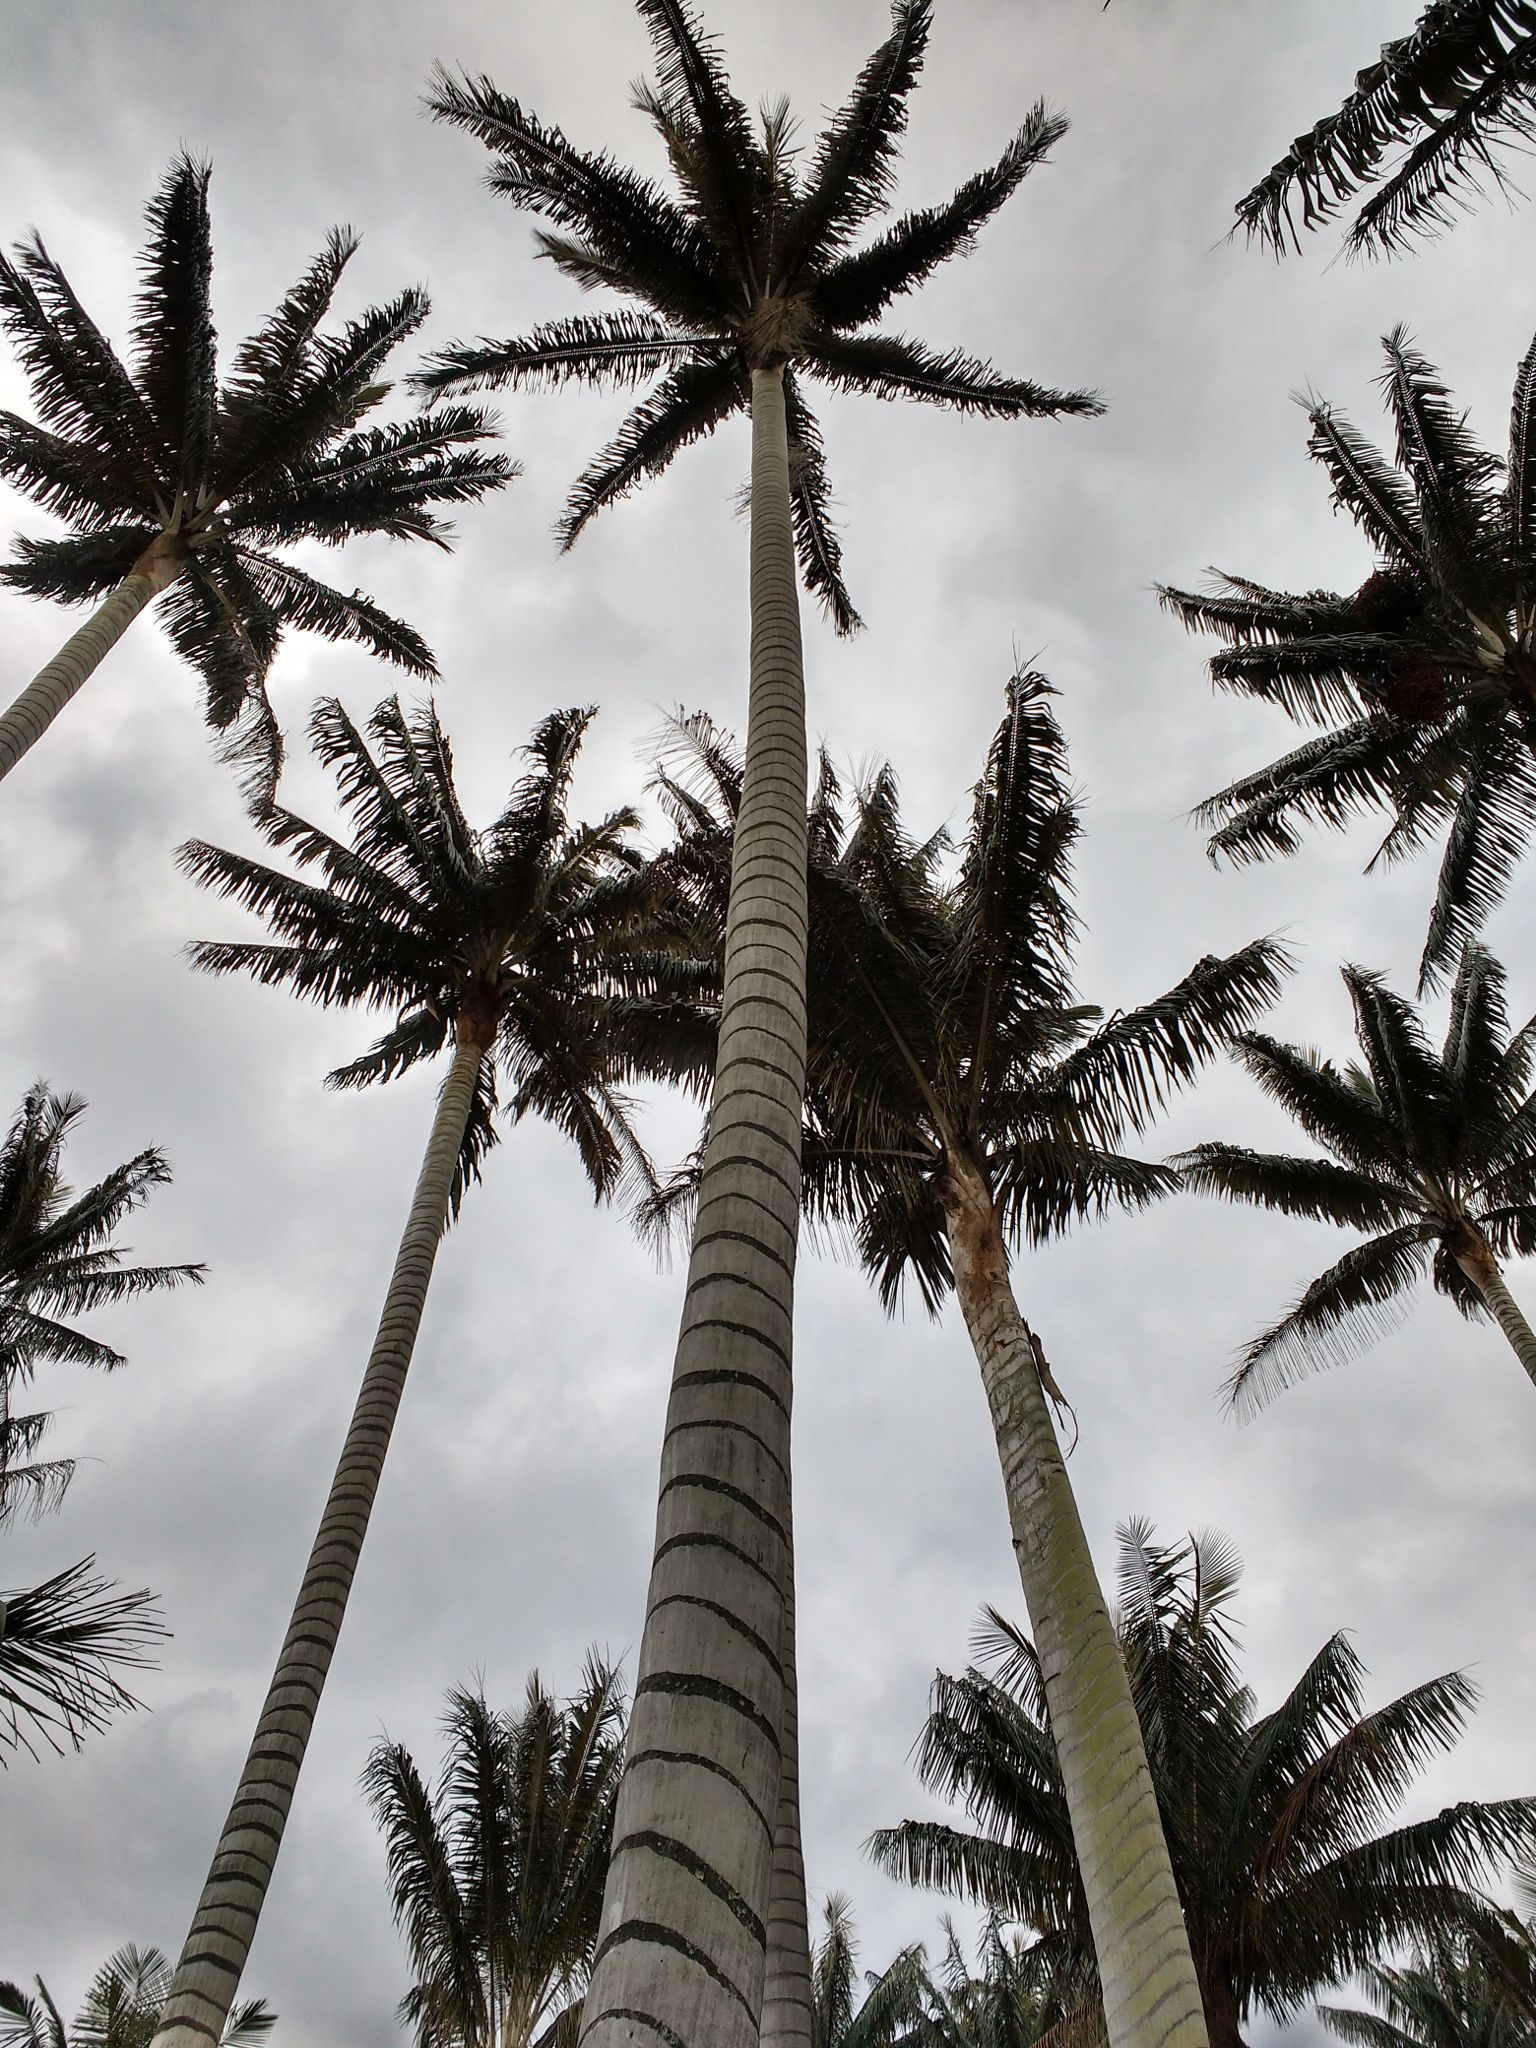 palms.jpg - Palm trees